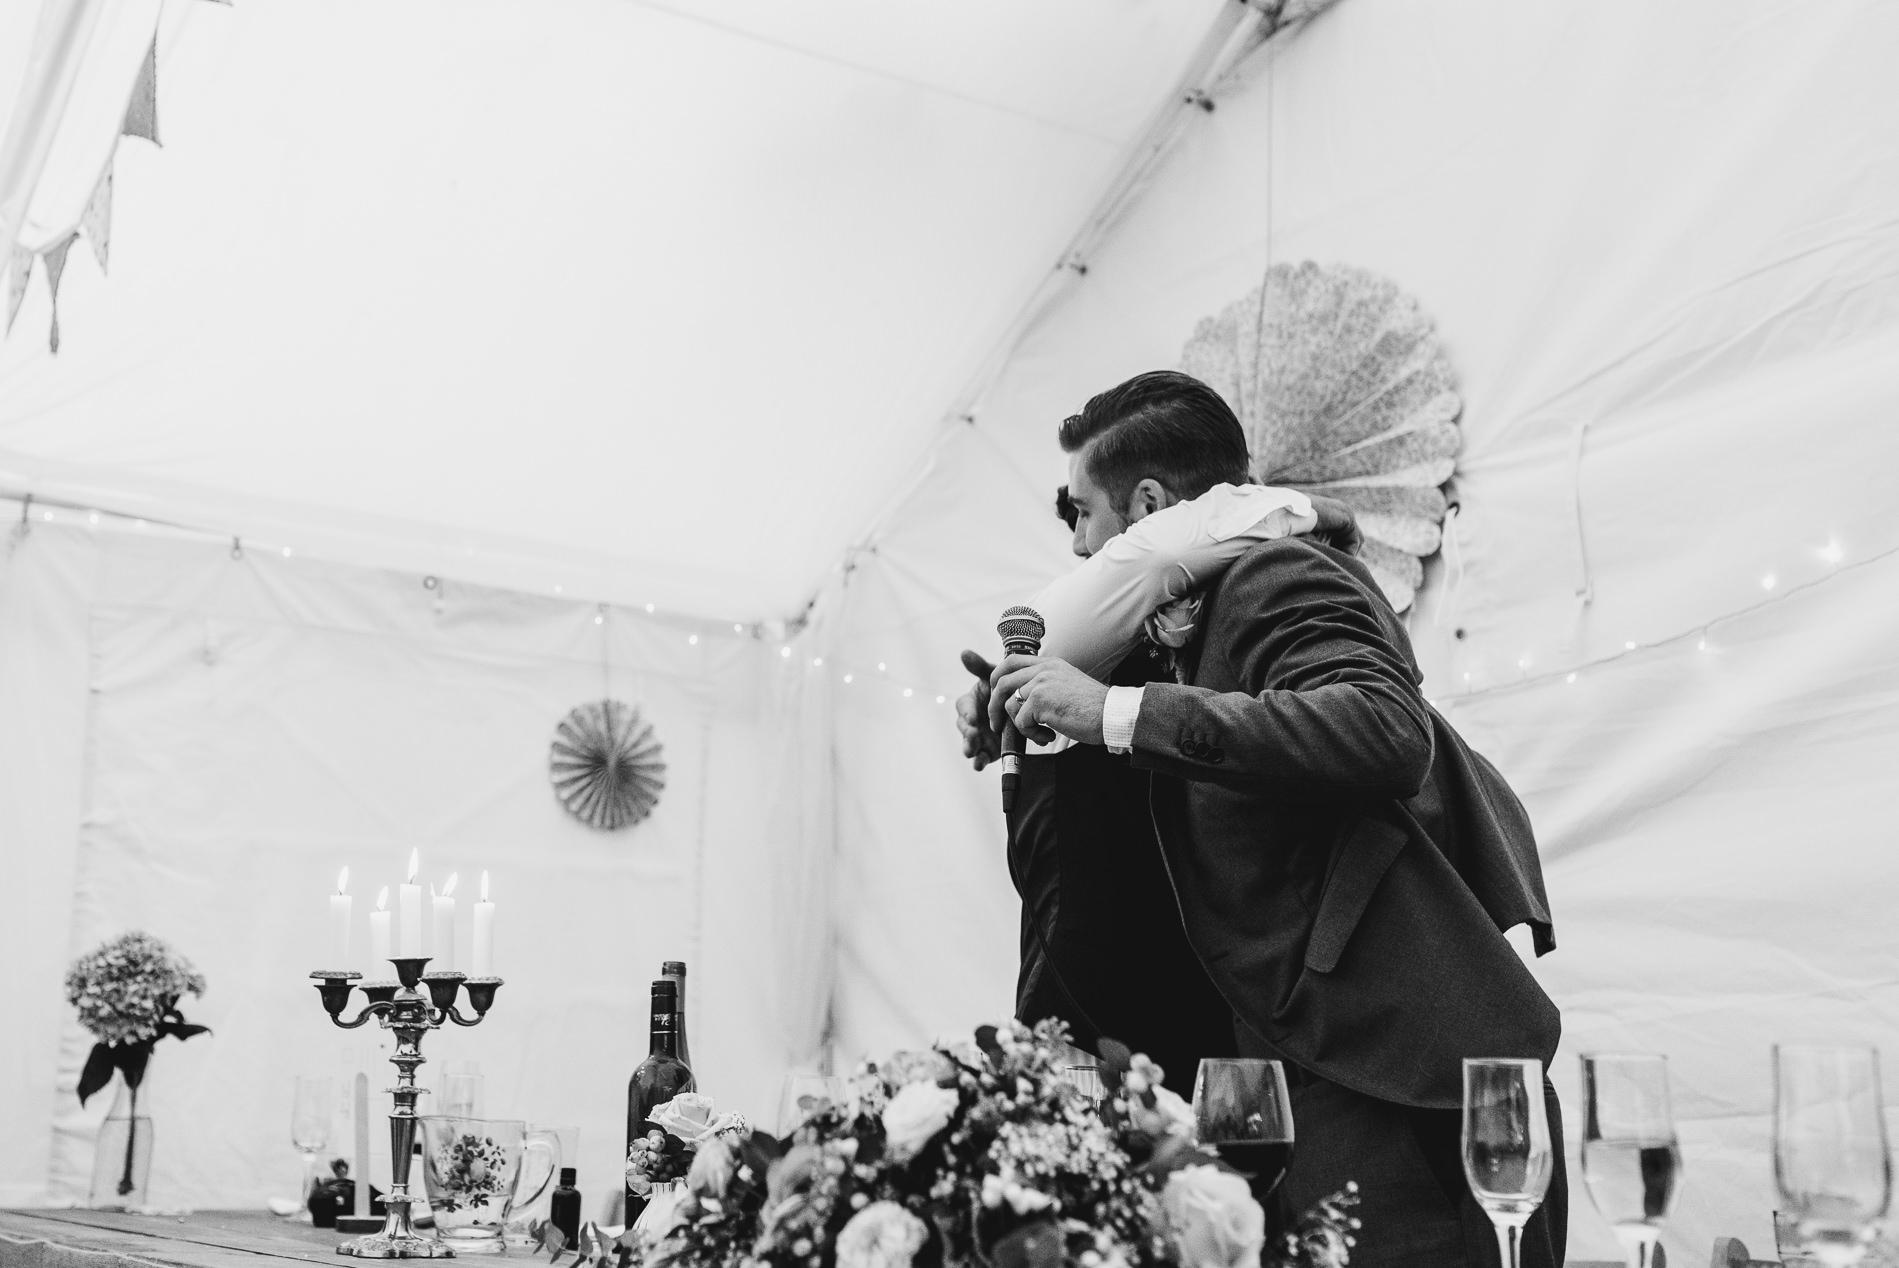 bohemian_wedding_lawshall_church_garden117